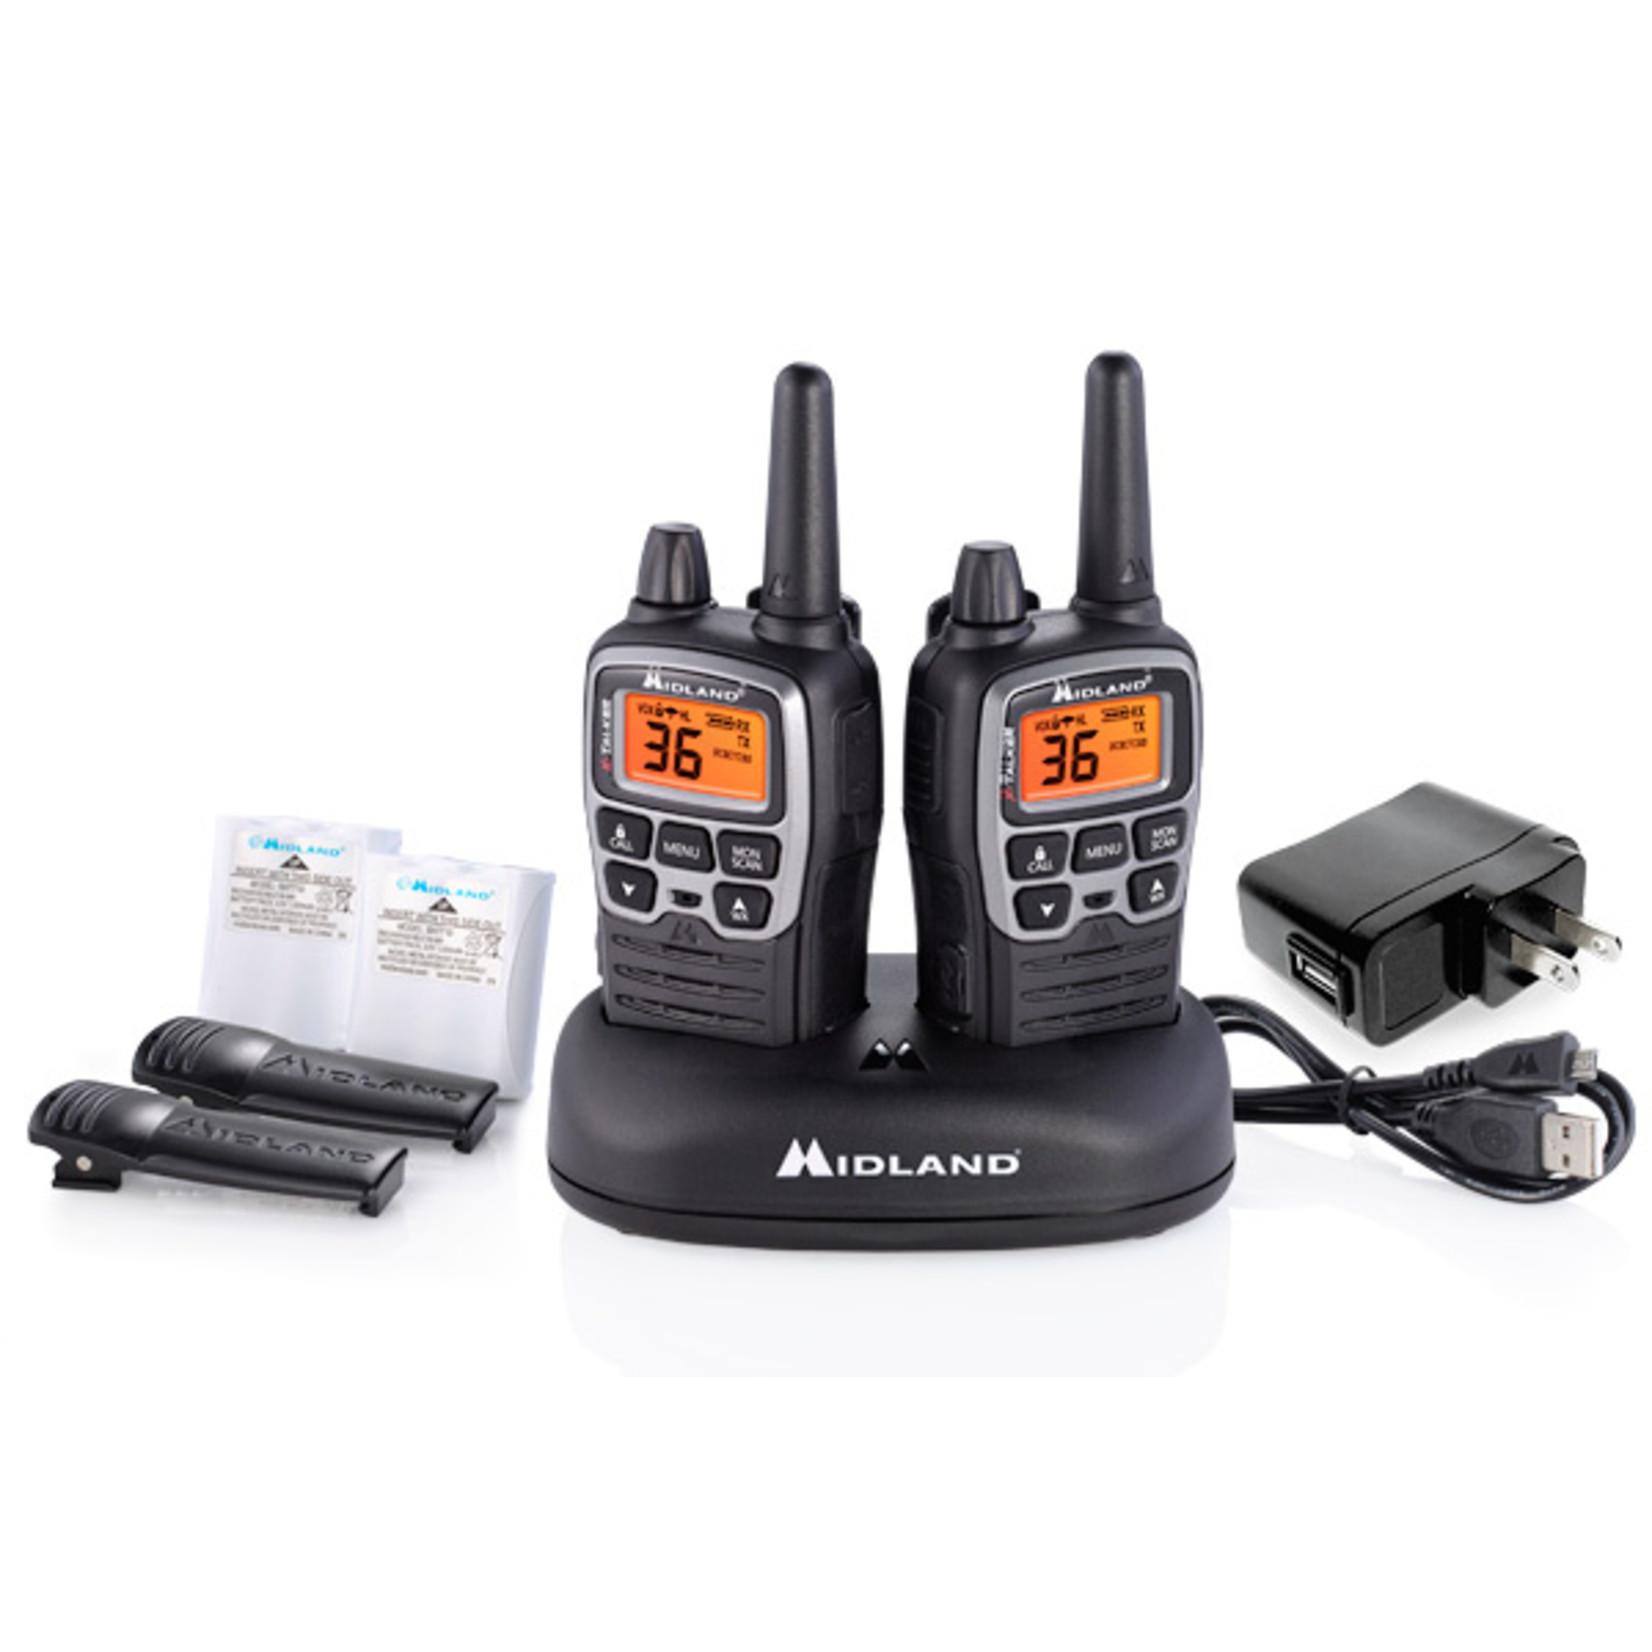 Midland Midland X-Talker T71VP3 Two-Way Radios